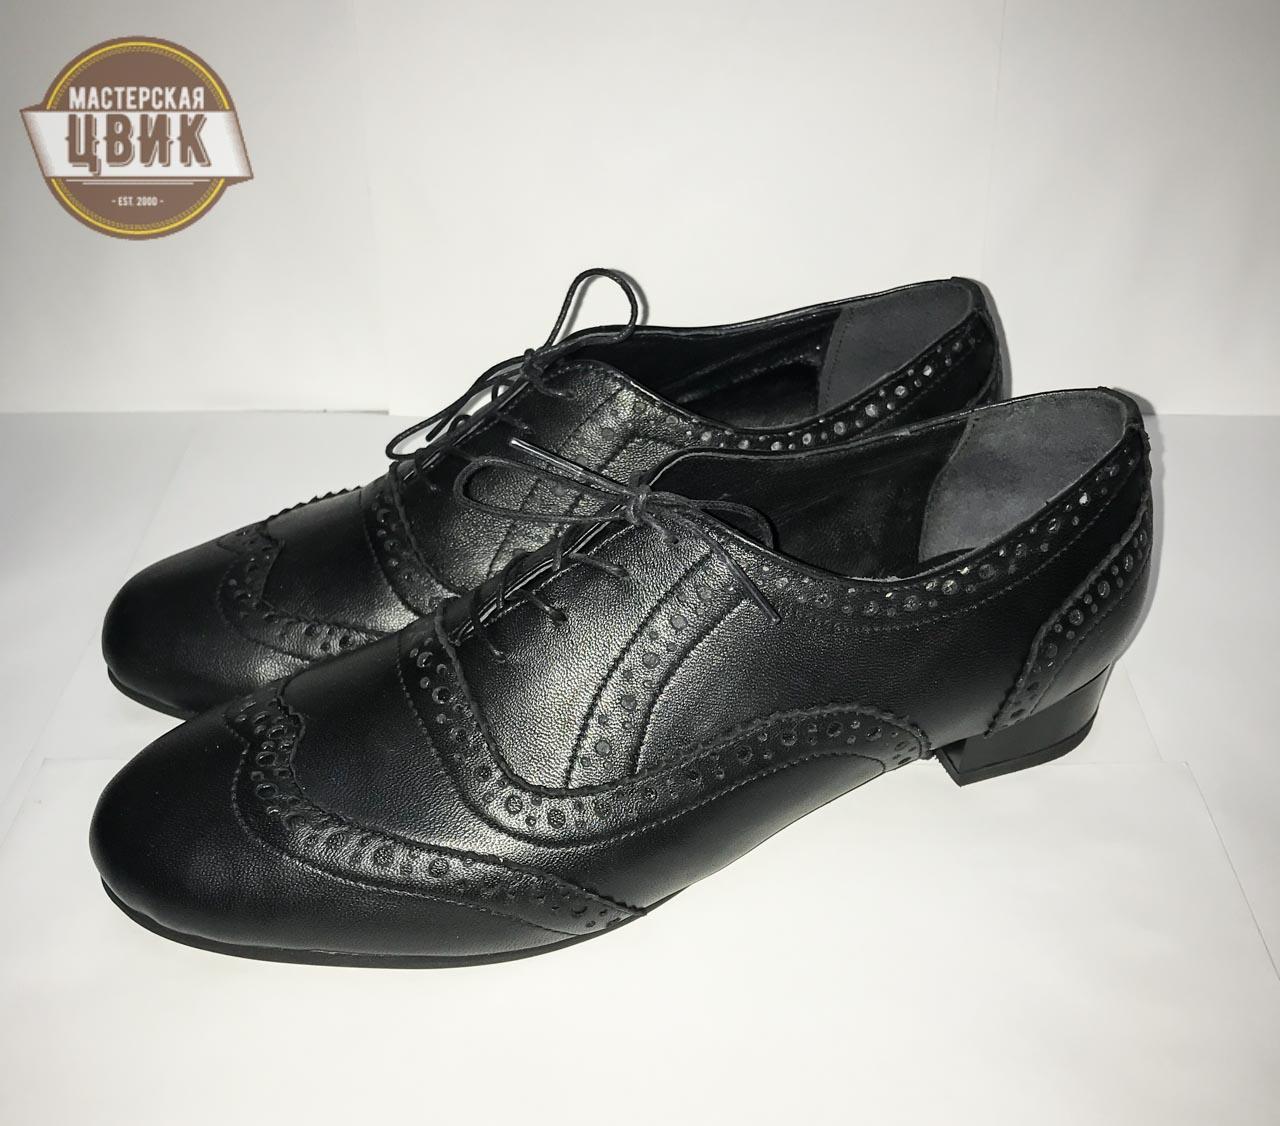 individualnyj-poshiv-obuvi-minsk-9 Индивидуальный пошив обуви